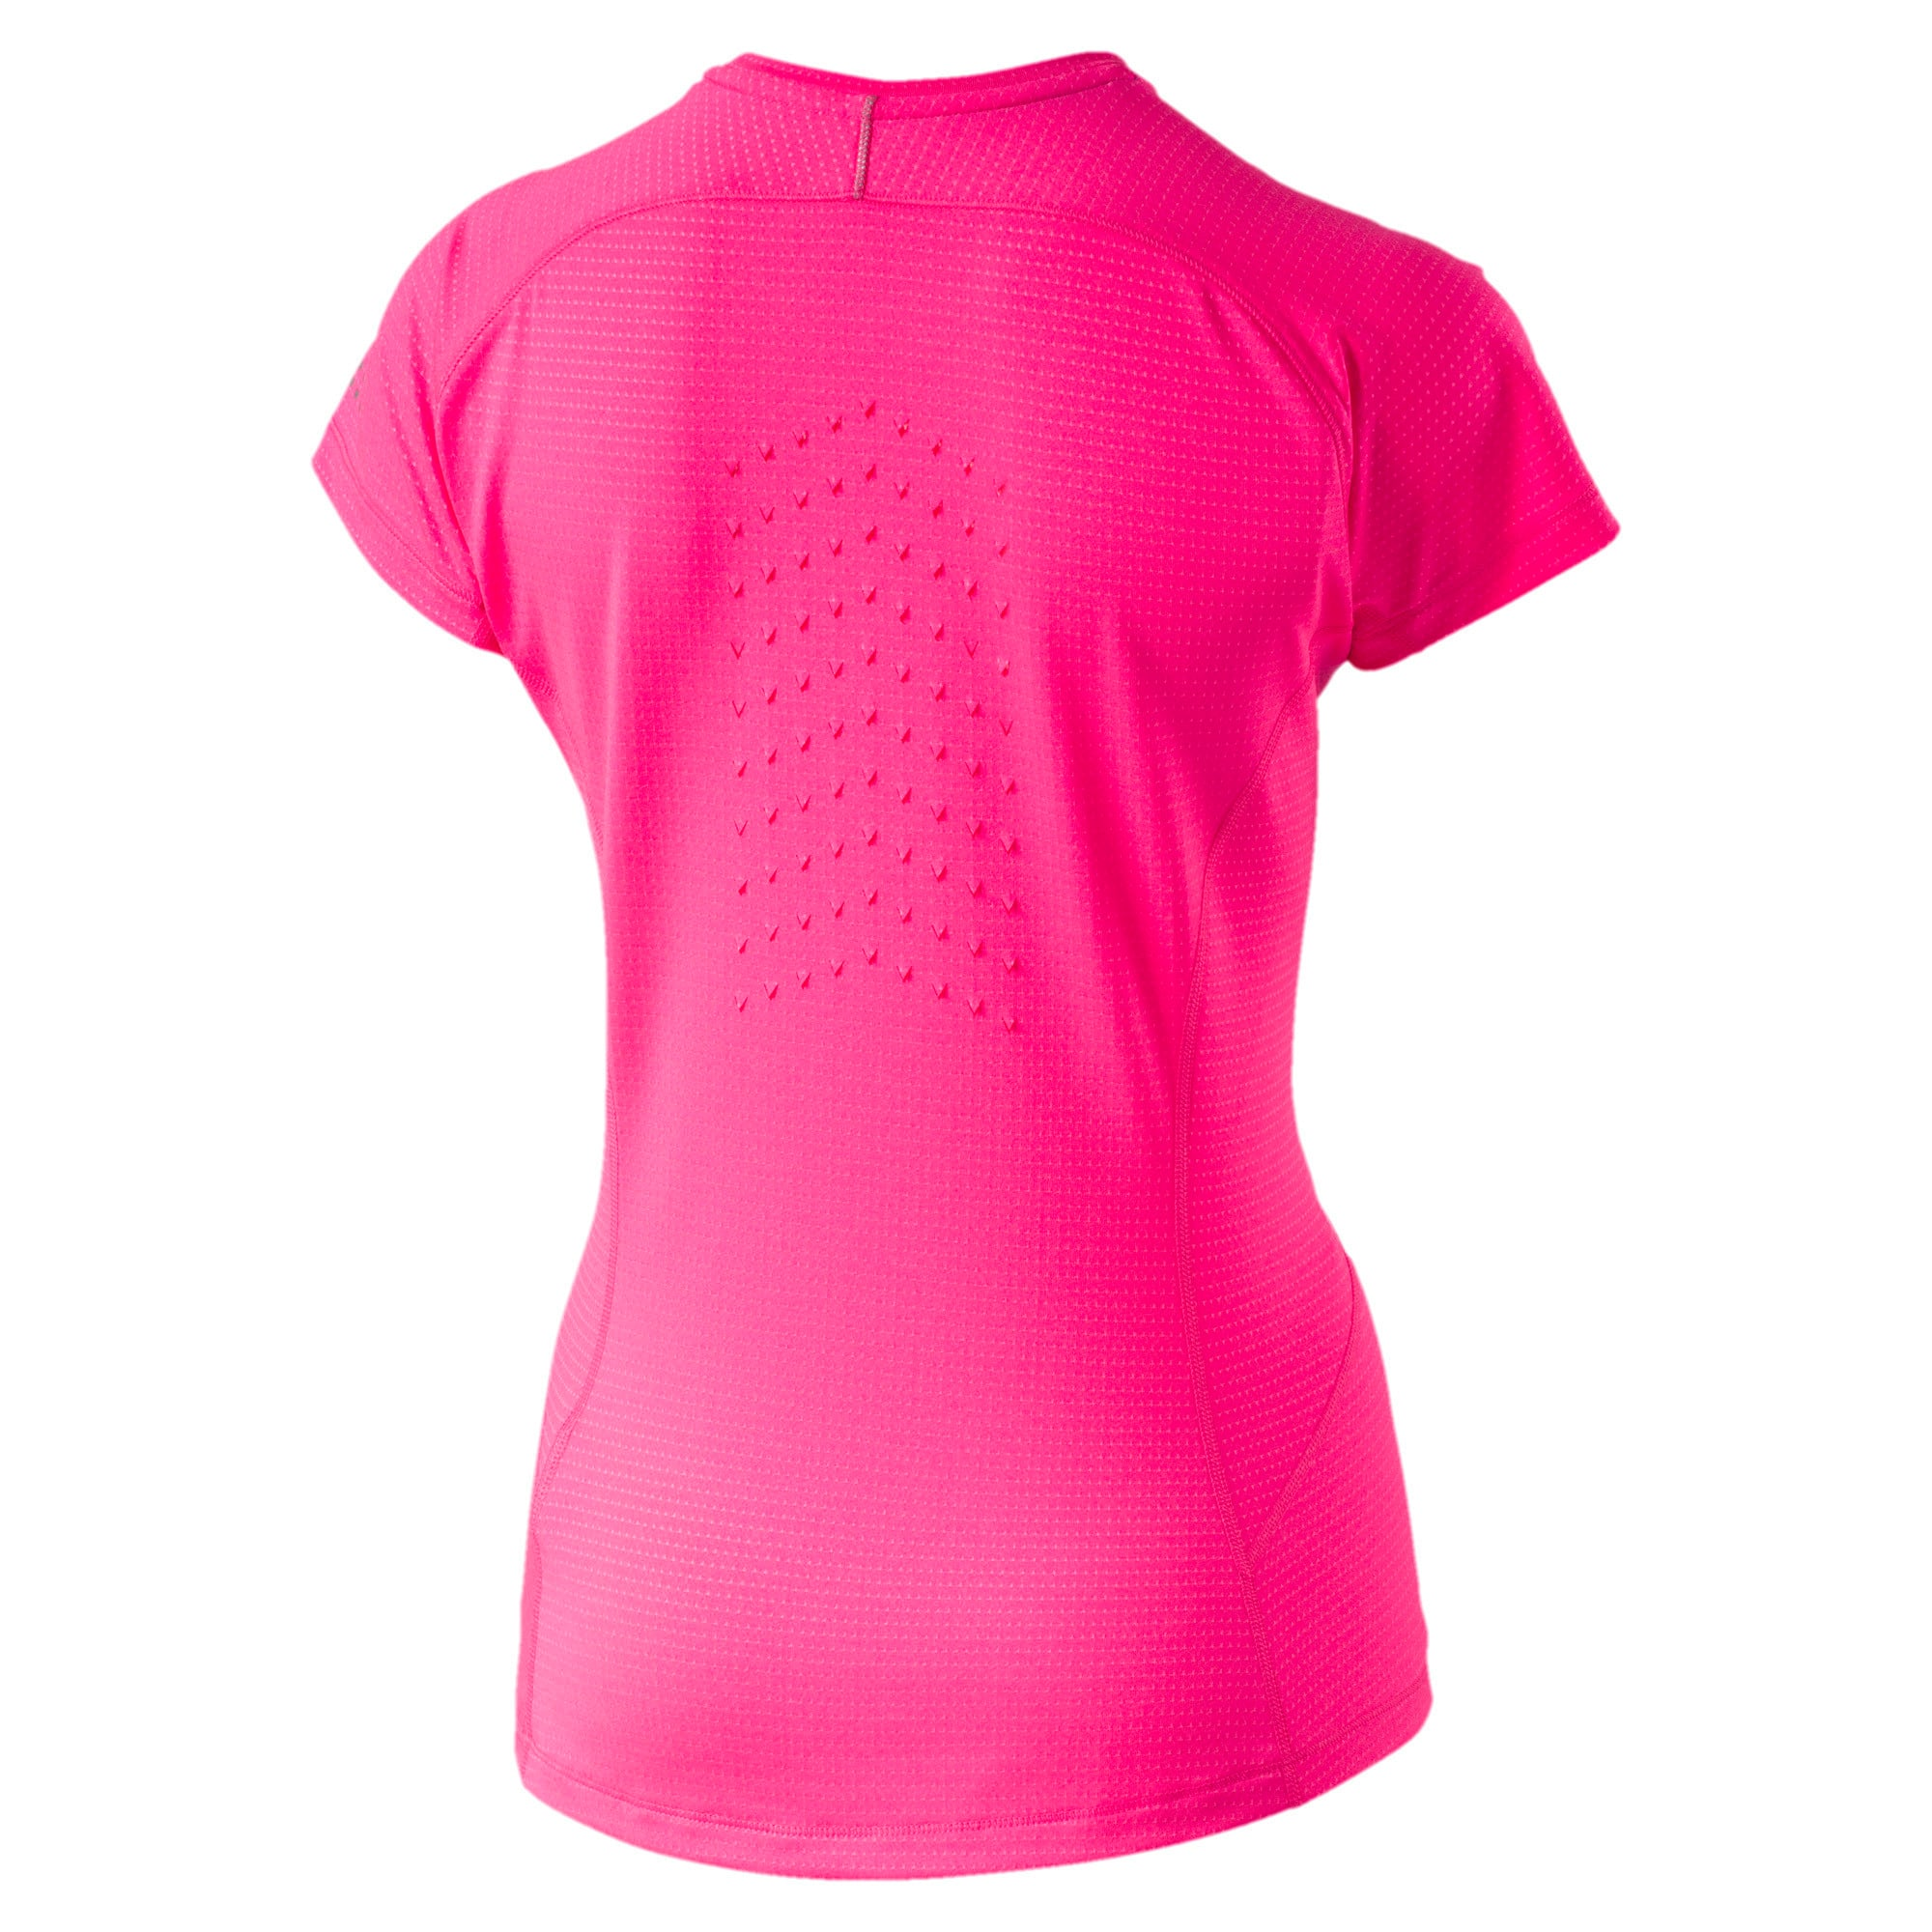 Thumbnail 4 of Women's Running Speed Short Sleeves Tee, KNOCKOUT PINK Heather, medium-IND